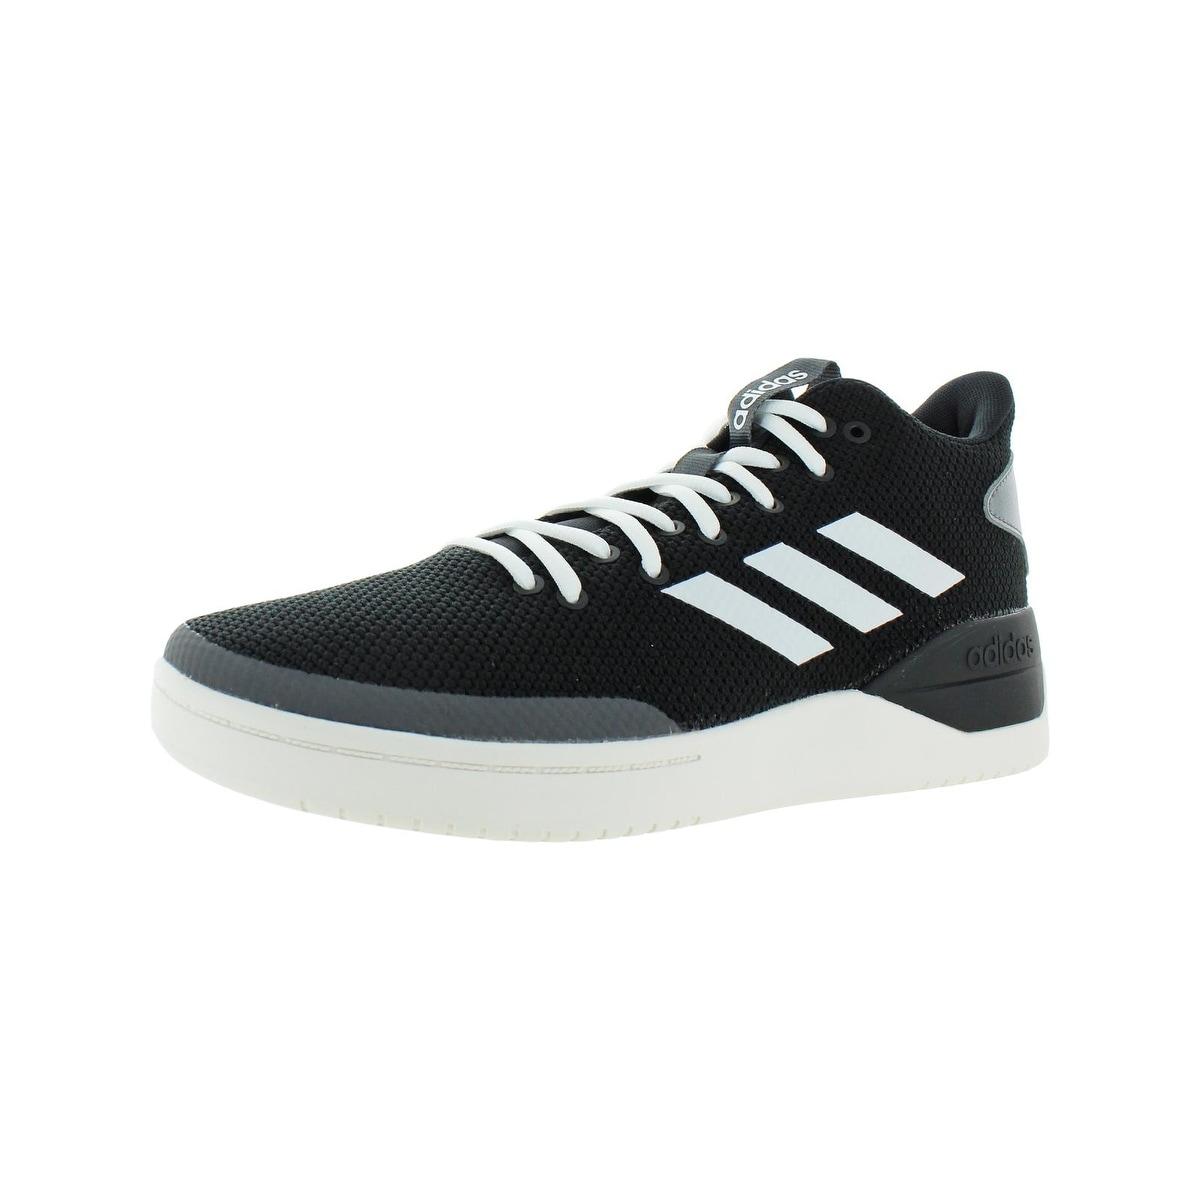 Shop Adidas Mens BBall 80s Basketball